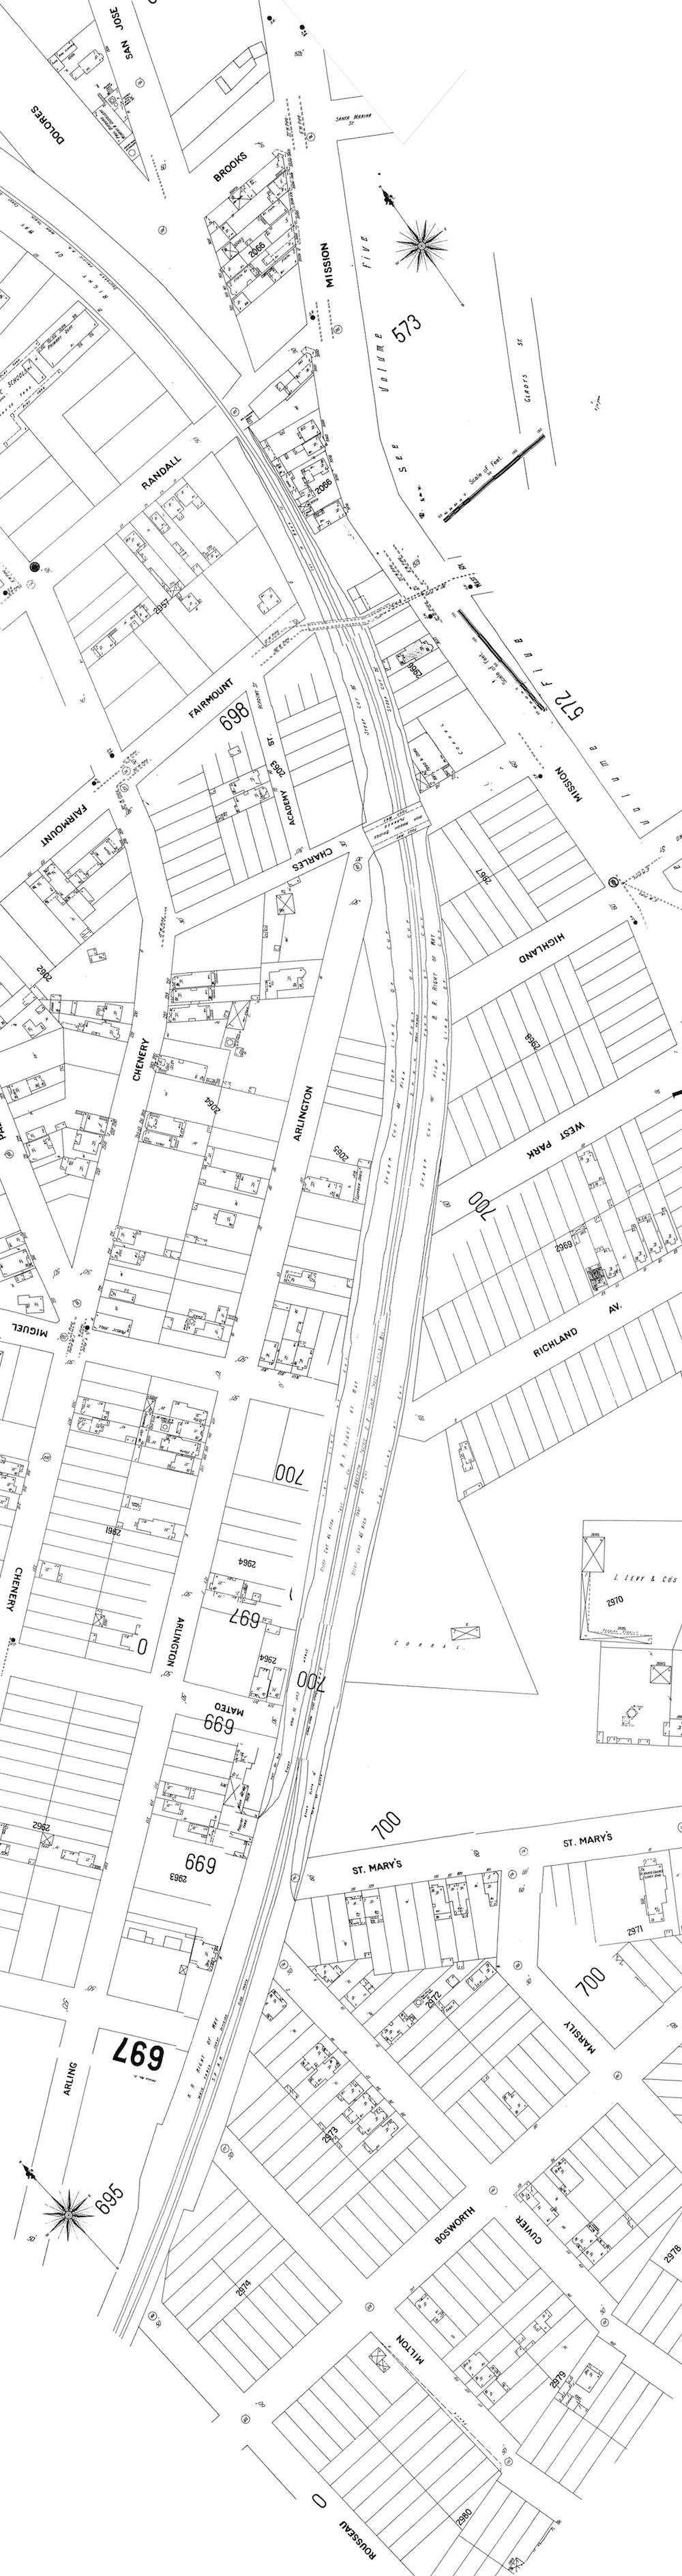 sanborn | Burrito Justice | Page 2 on map of lomita california, map of calaveras california, map of frazier park california, map of cazadero california, map of the bay area california, map of california coast, map of mountain house california, map of mt. view california, map of pollock pines california, map of desert hot springs california, map of santa clara california, map of buffalo california, map of california cities, map of concord california, map of hollister california, map of southern california, map of springfield california, map of monterey california, map of leucadia california, map of oakland california,